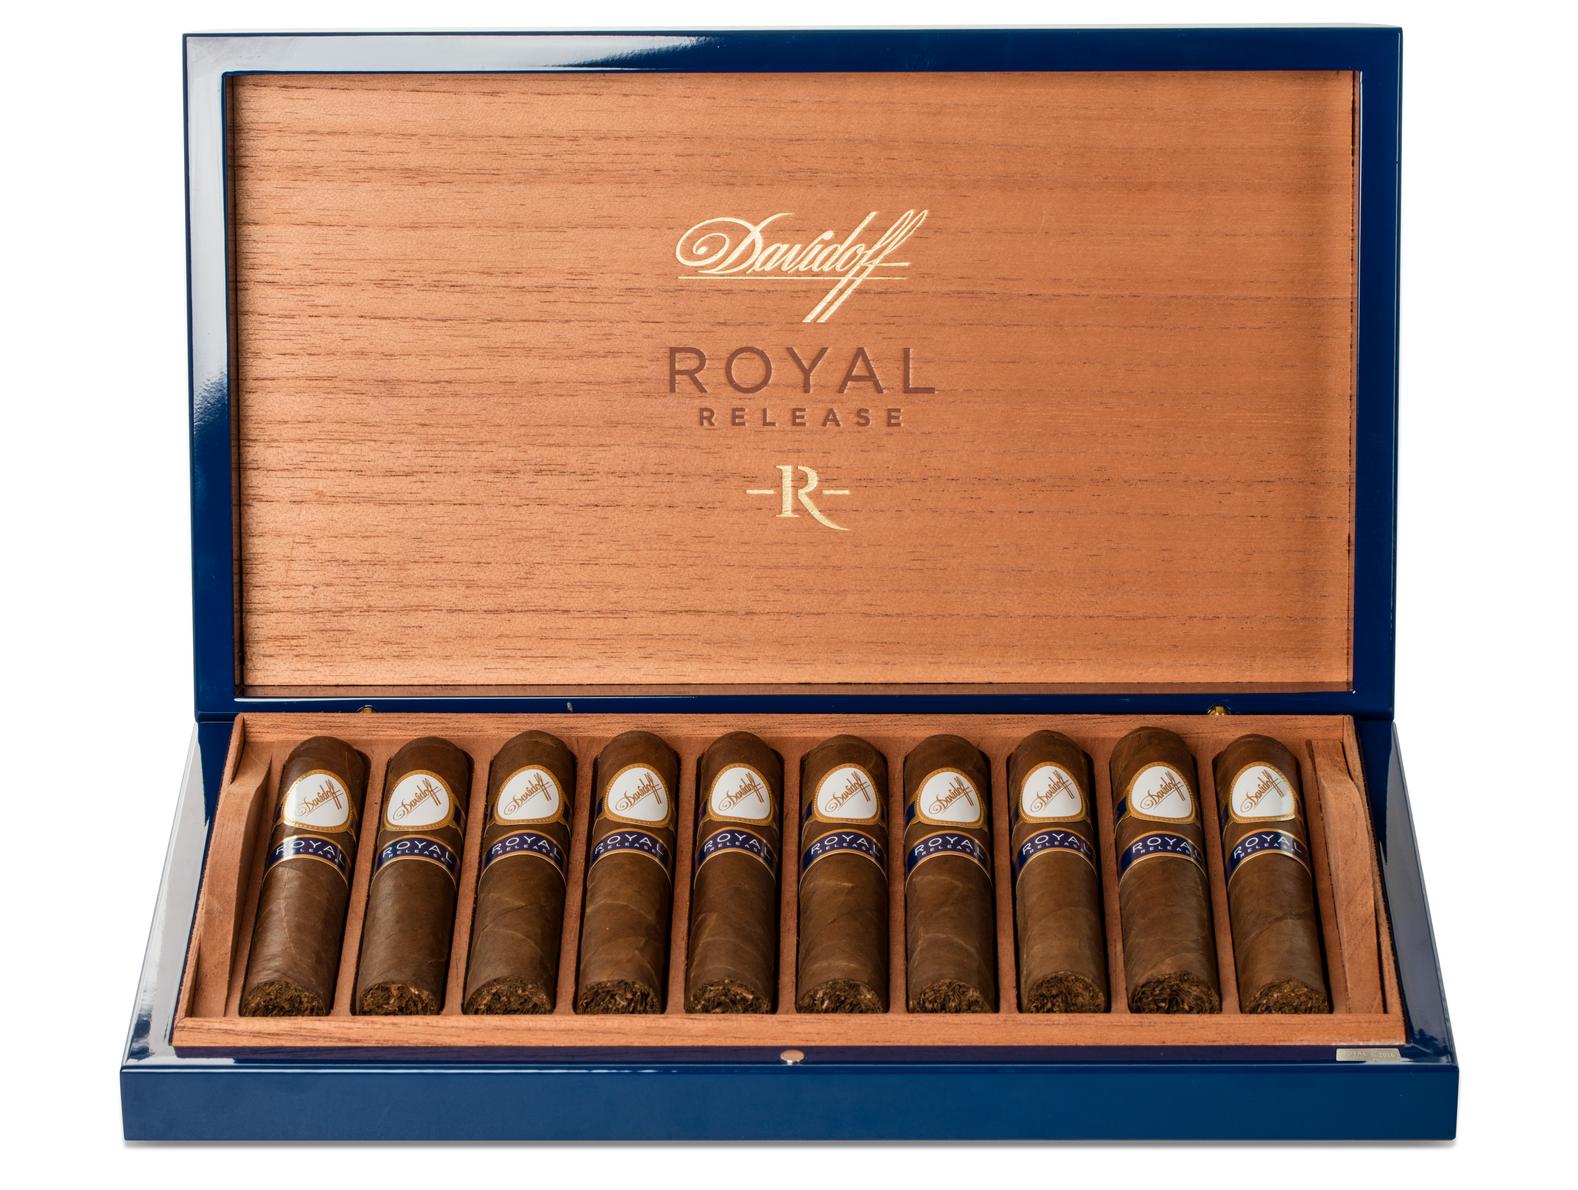 davidoff_royal_release_robusto